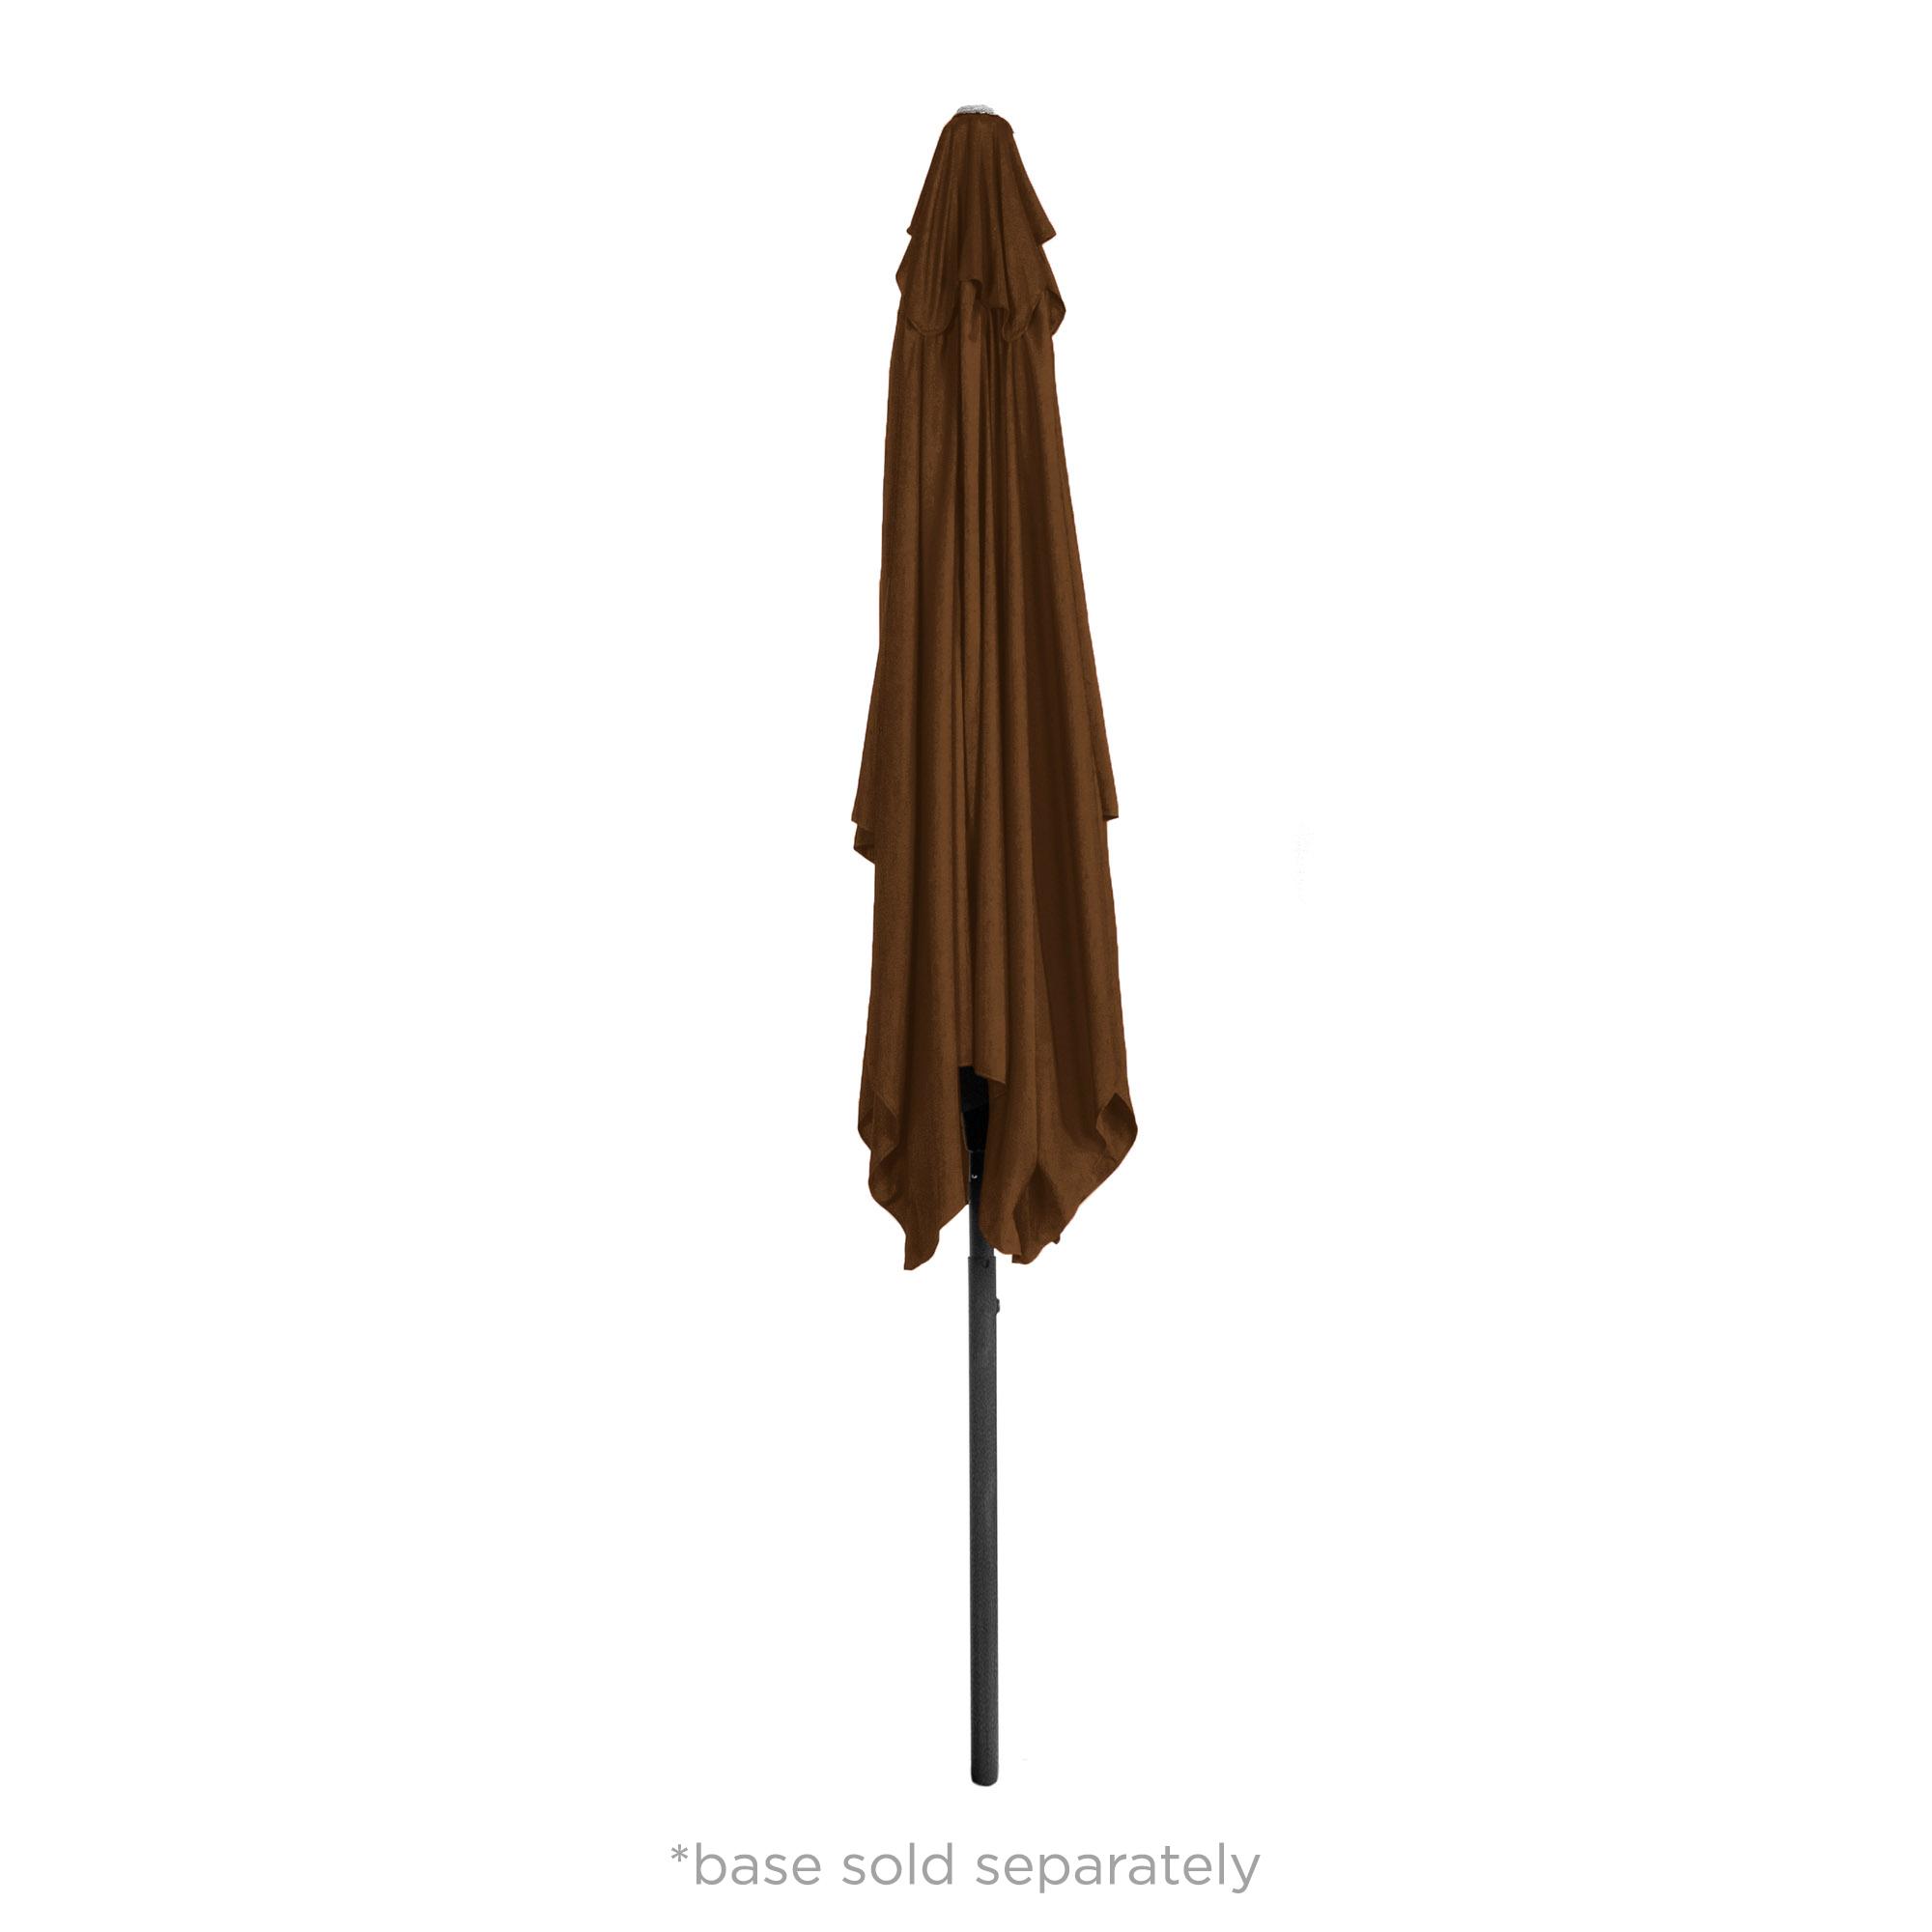 BCP-8x11ft-Rectangular-Patio-Umbrella-w-Easy-Crank-UV-Resistant-Fabric thumbnail 13